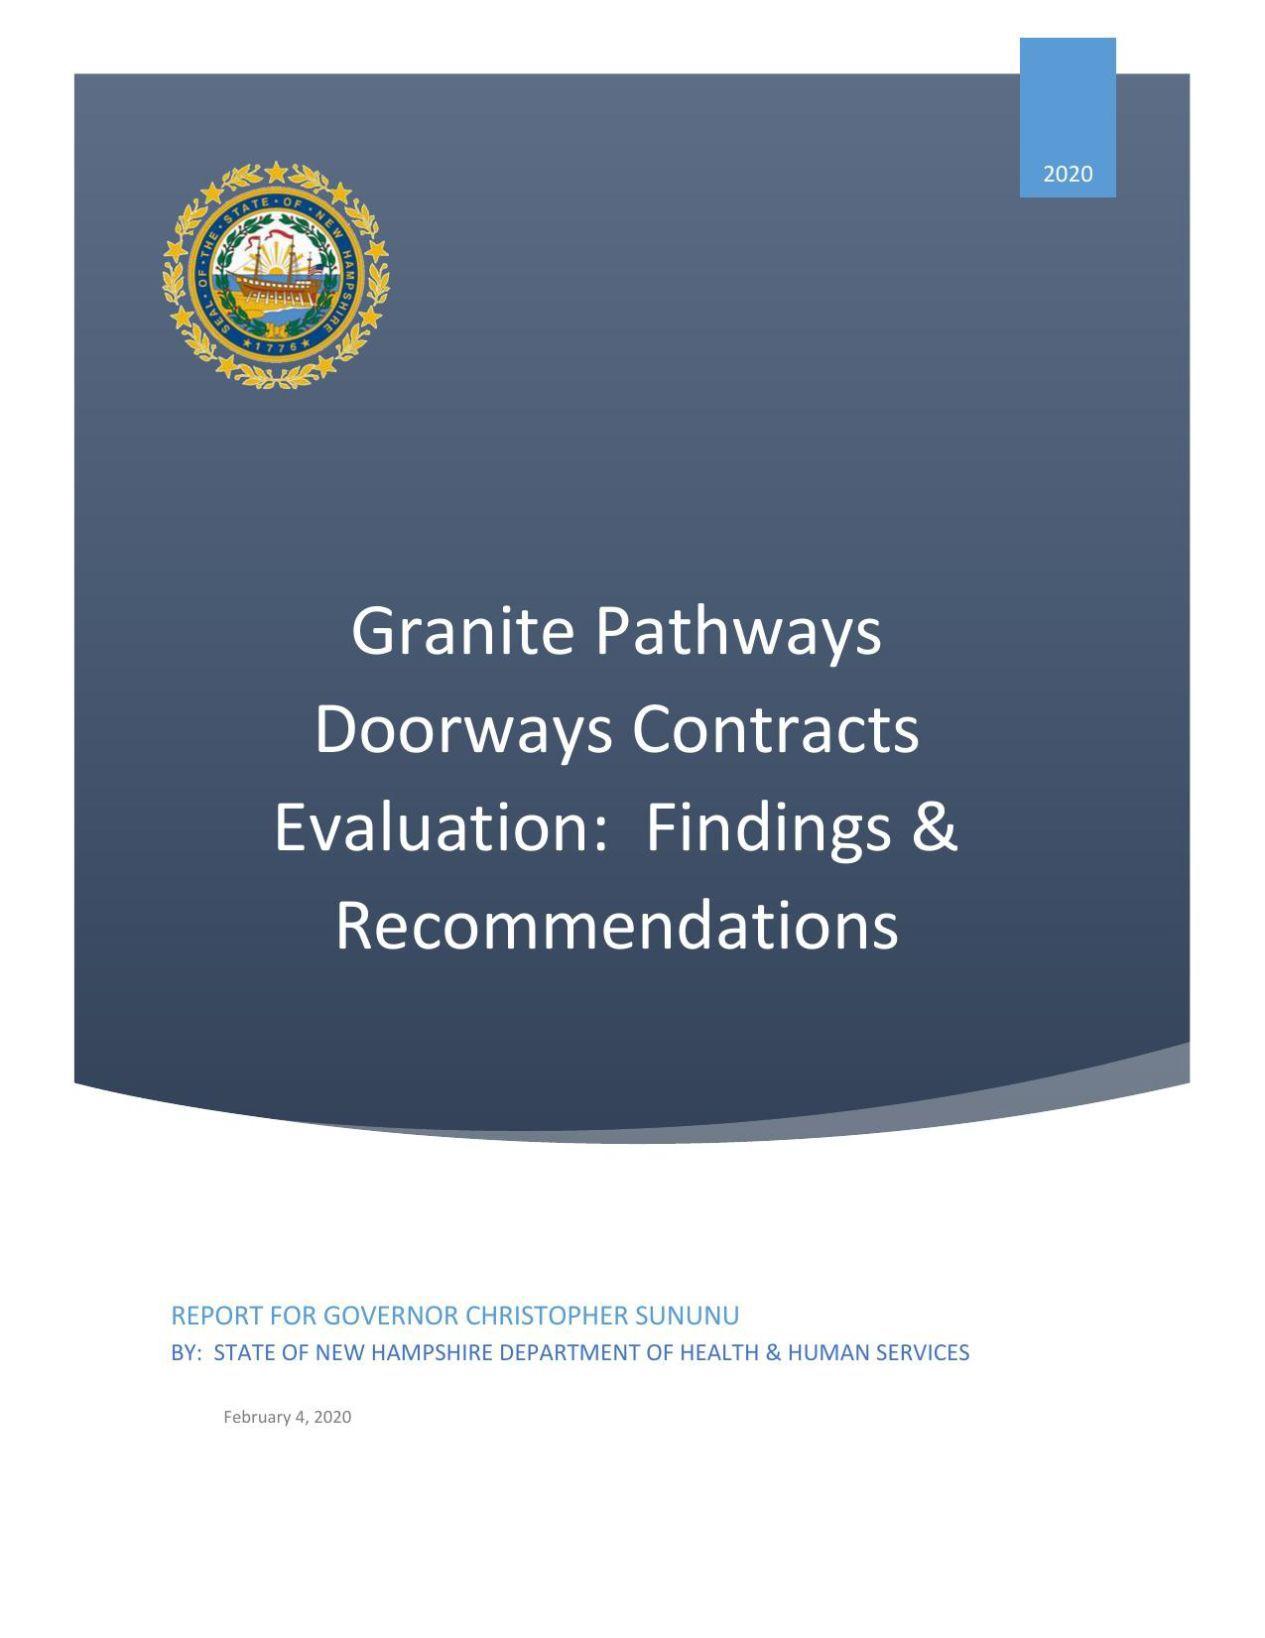 DHHS Doorway review